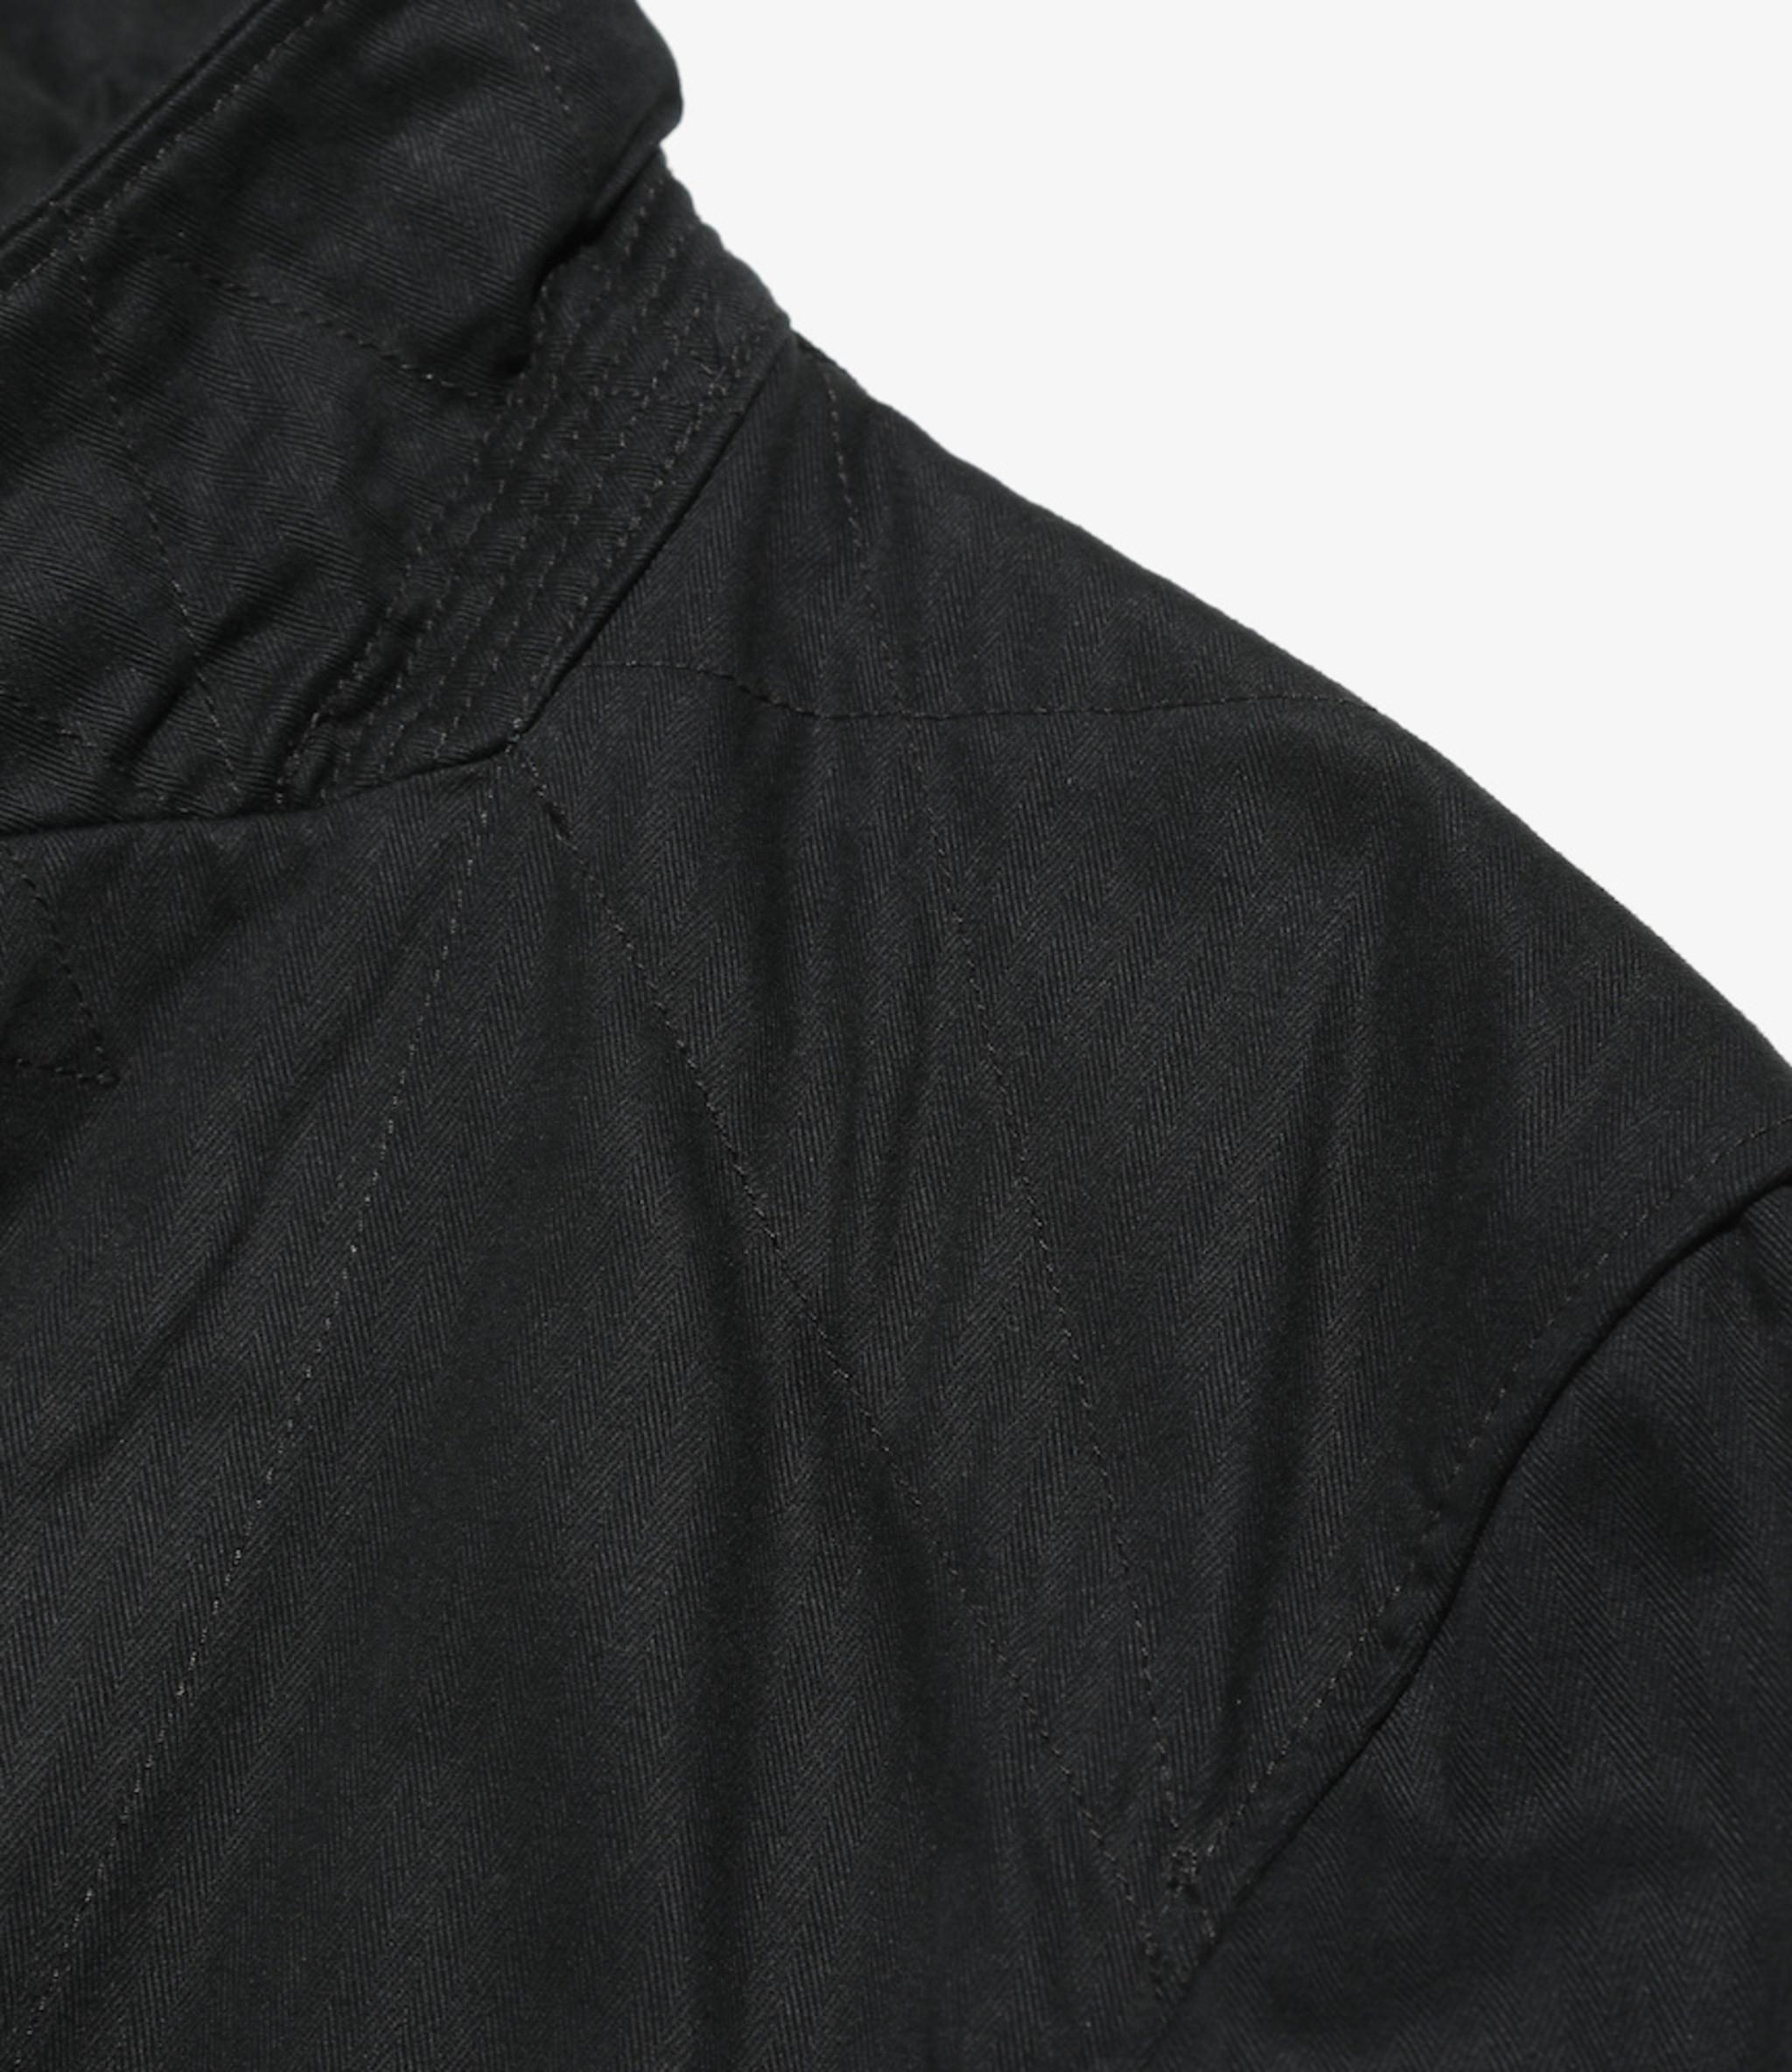 Engineered Garments Bedford Jacket - Black Cotton Herringbone Twill